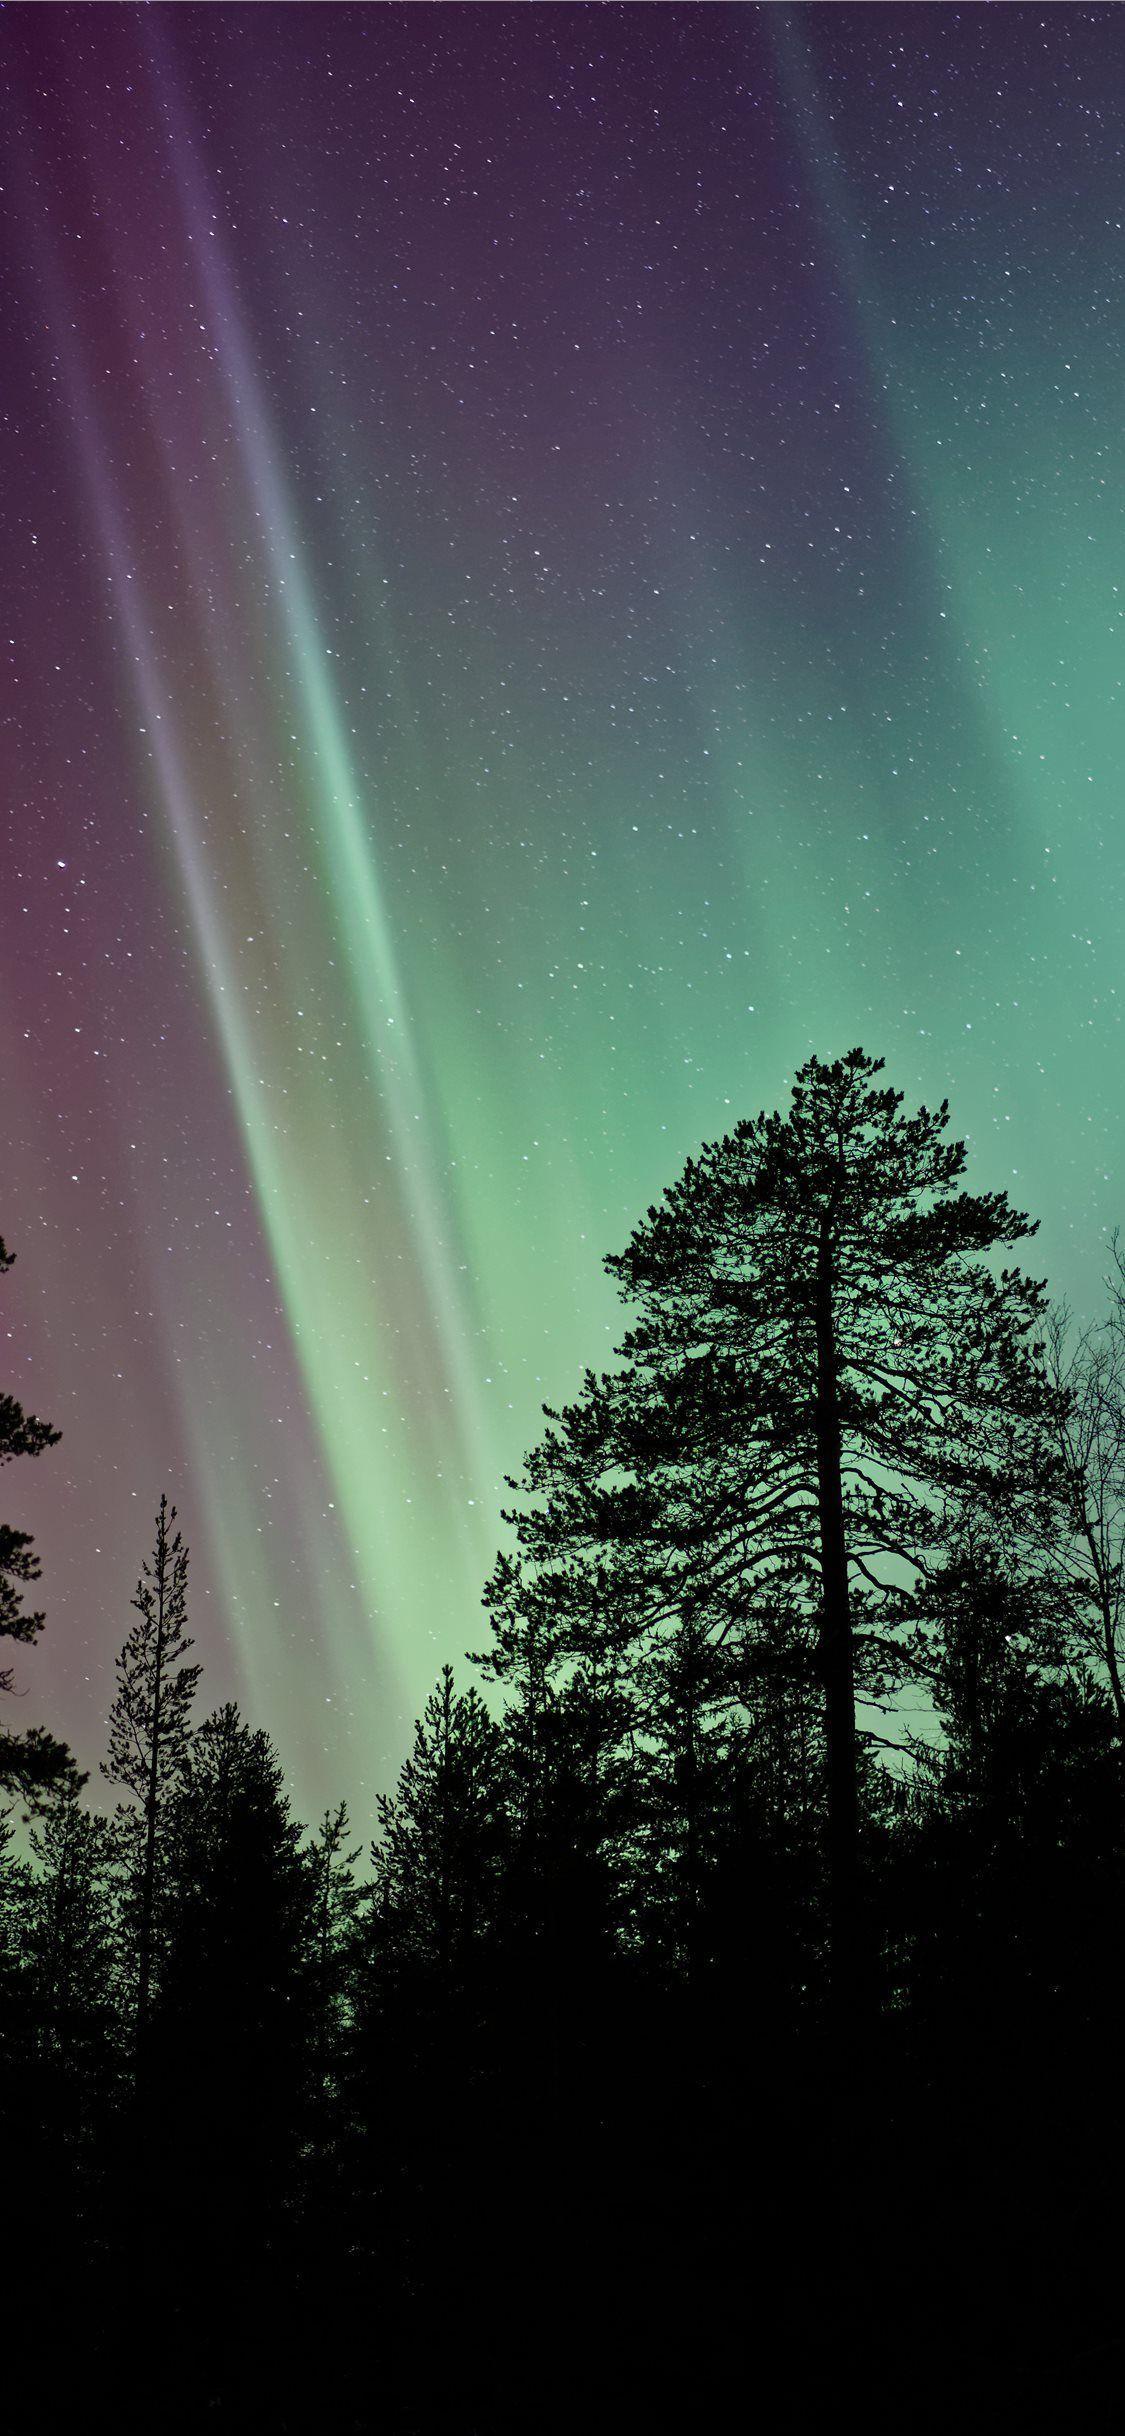 Aurora Borealis Iphone Wallpapers Top Free Aurora Borealis Iphone Backgrounds Wallpaperaccess